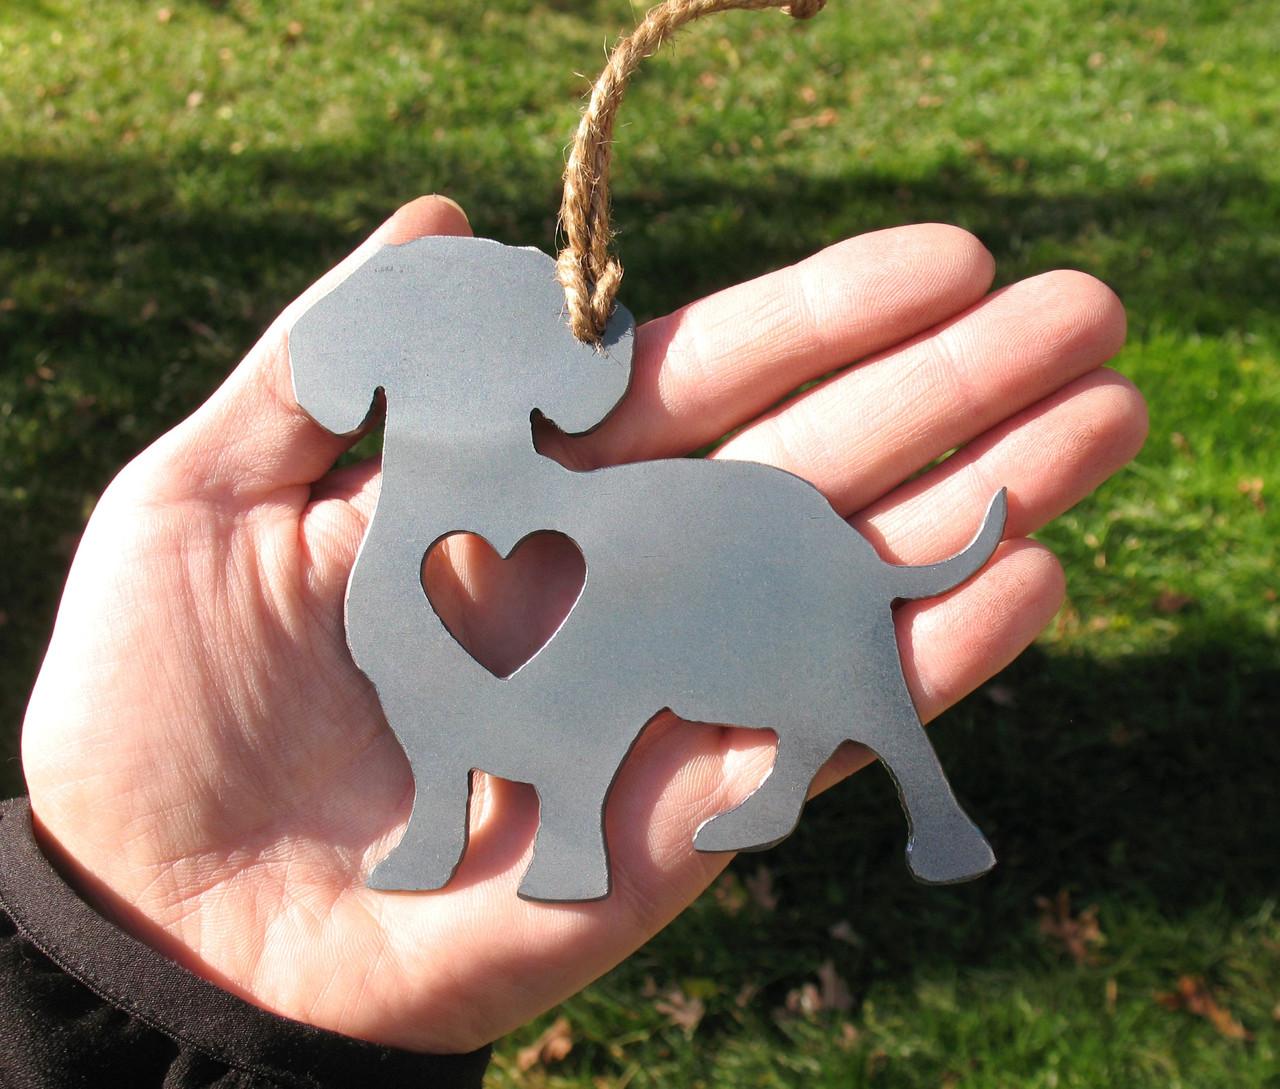 Dachshund 3 Pet Loss Gift Ornament - Pet Memorial - Dog Sympathy Remembrance Gift - Metal Dog Christmas Ornament